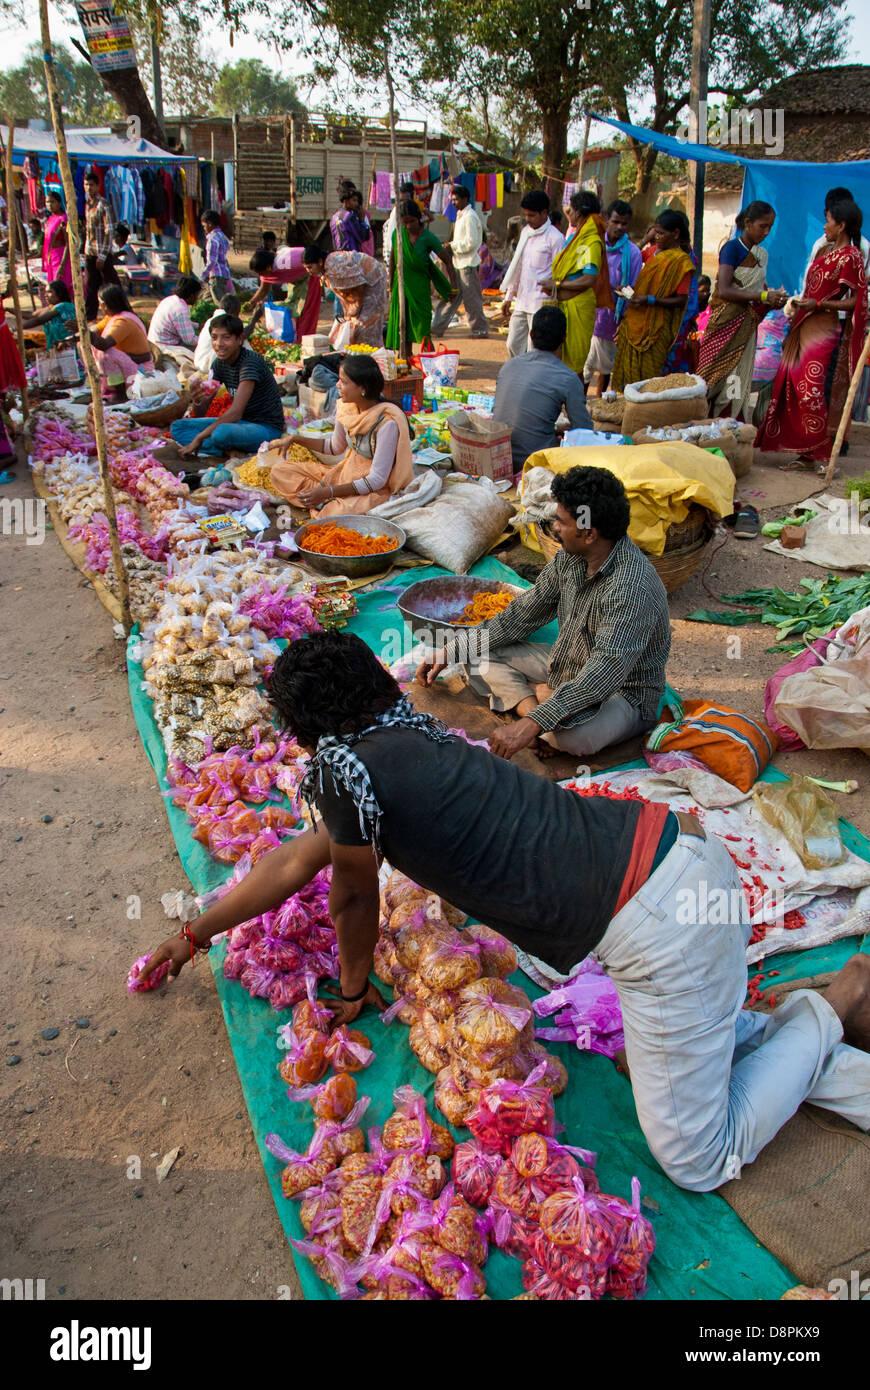 Indian farmers market in Mocha Village, Madhya Pradesh, India - Stock Image